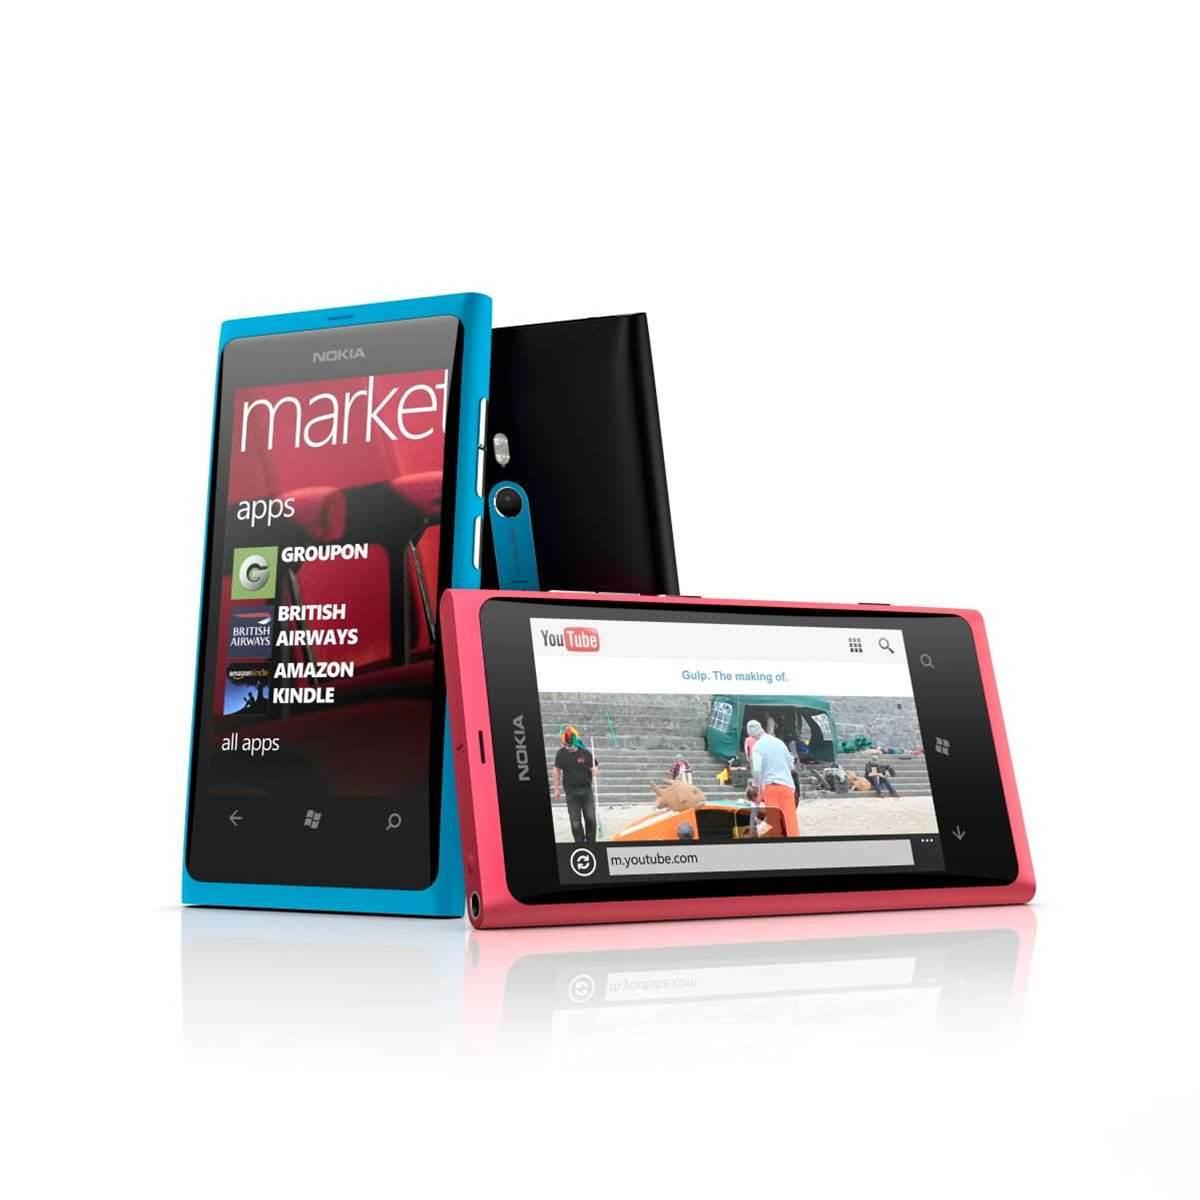 Nokia to make comeback in 2017 under HMD Global